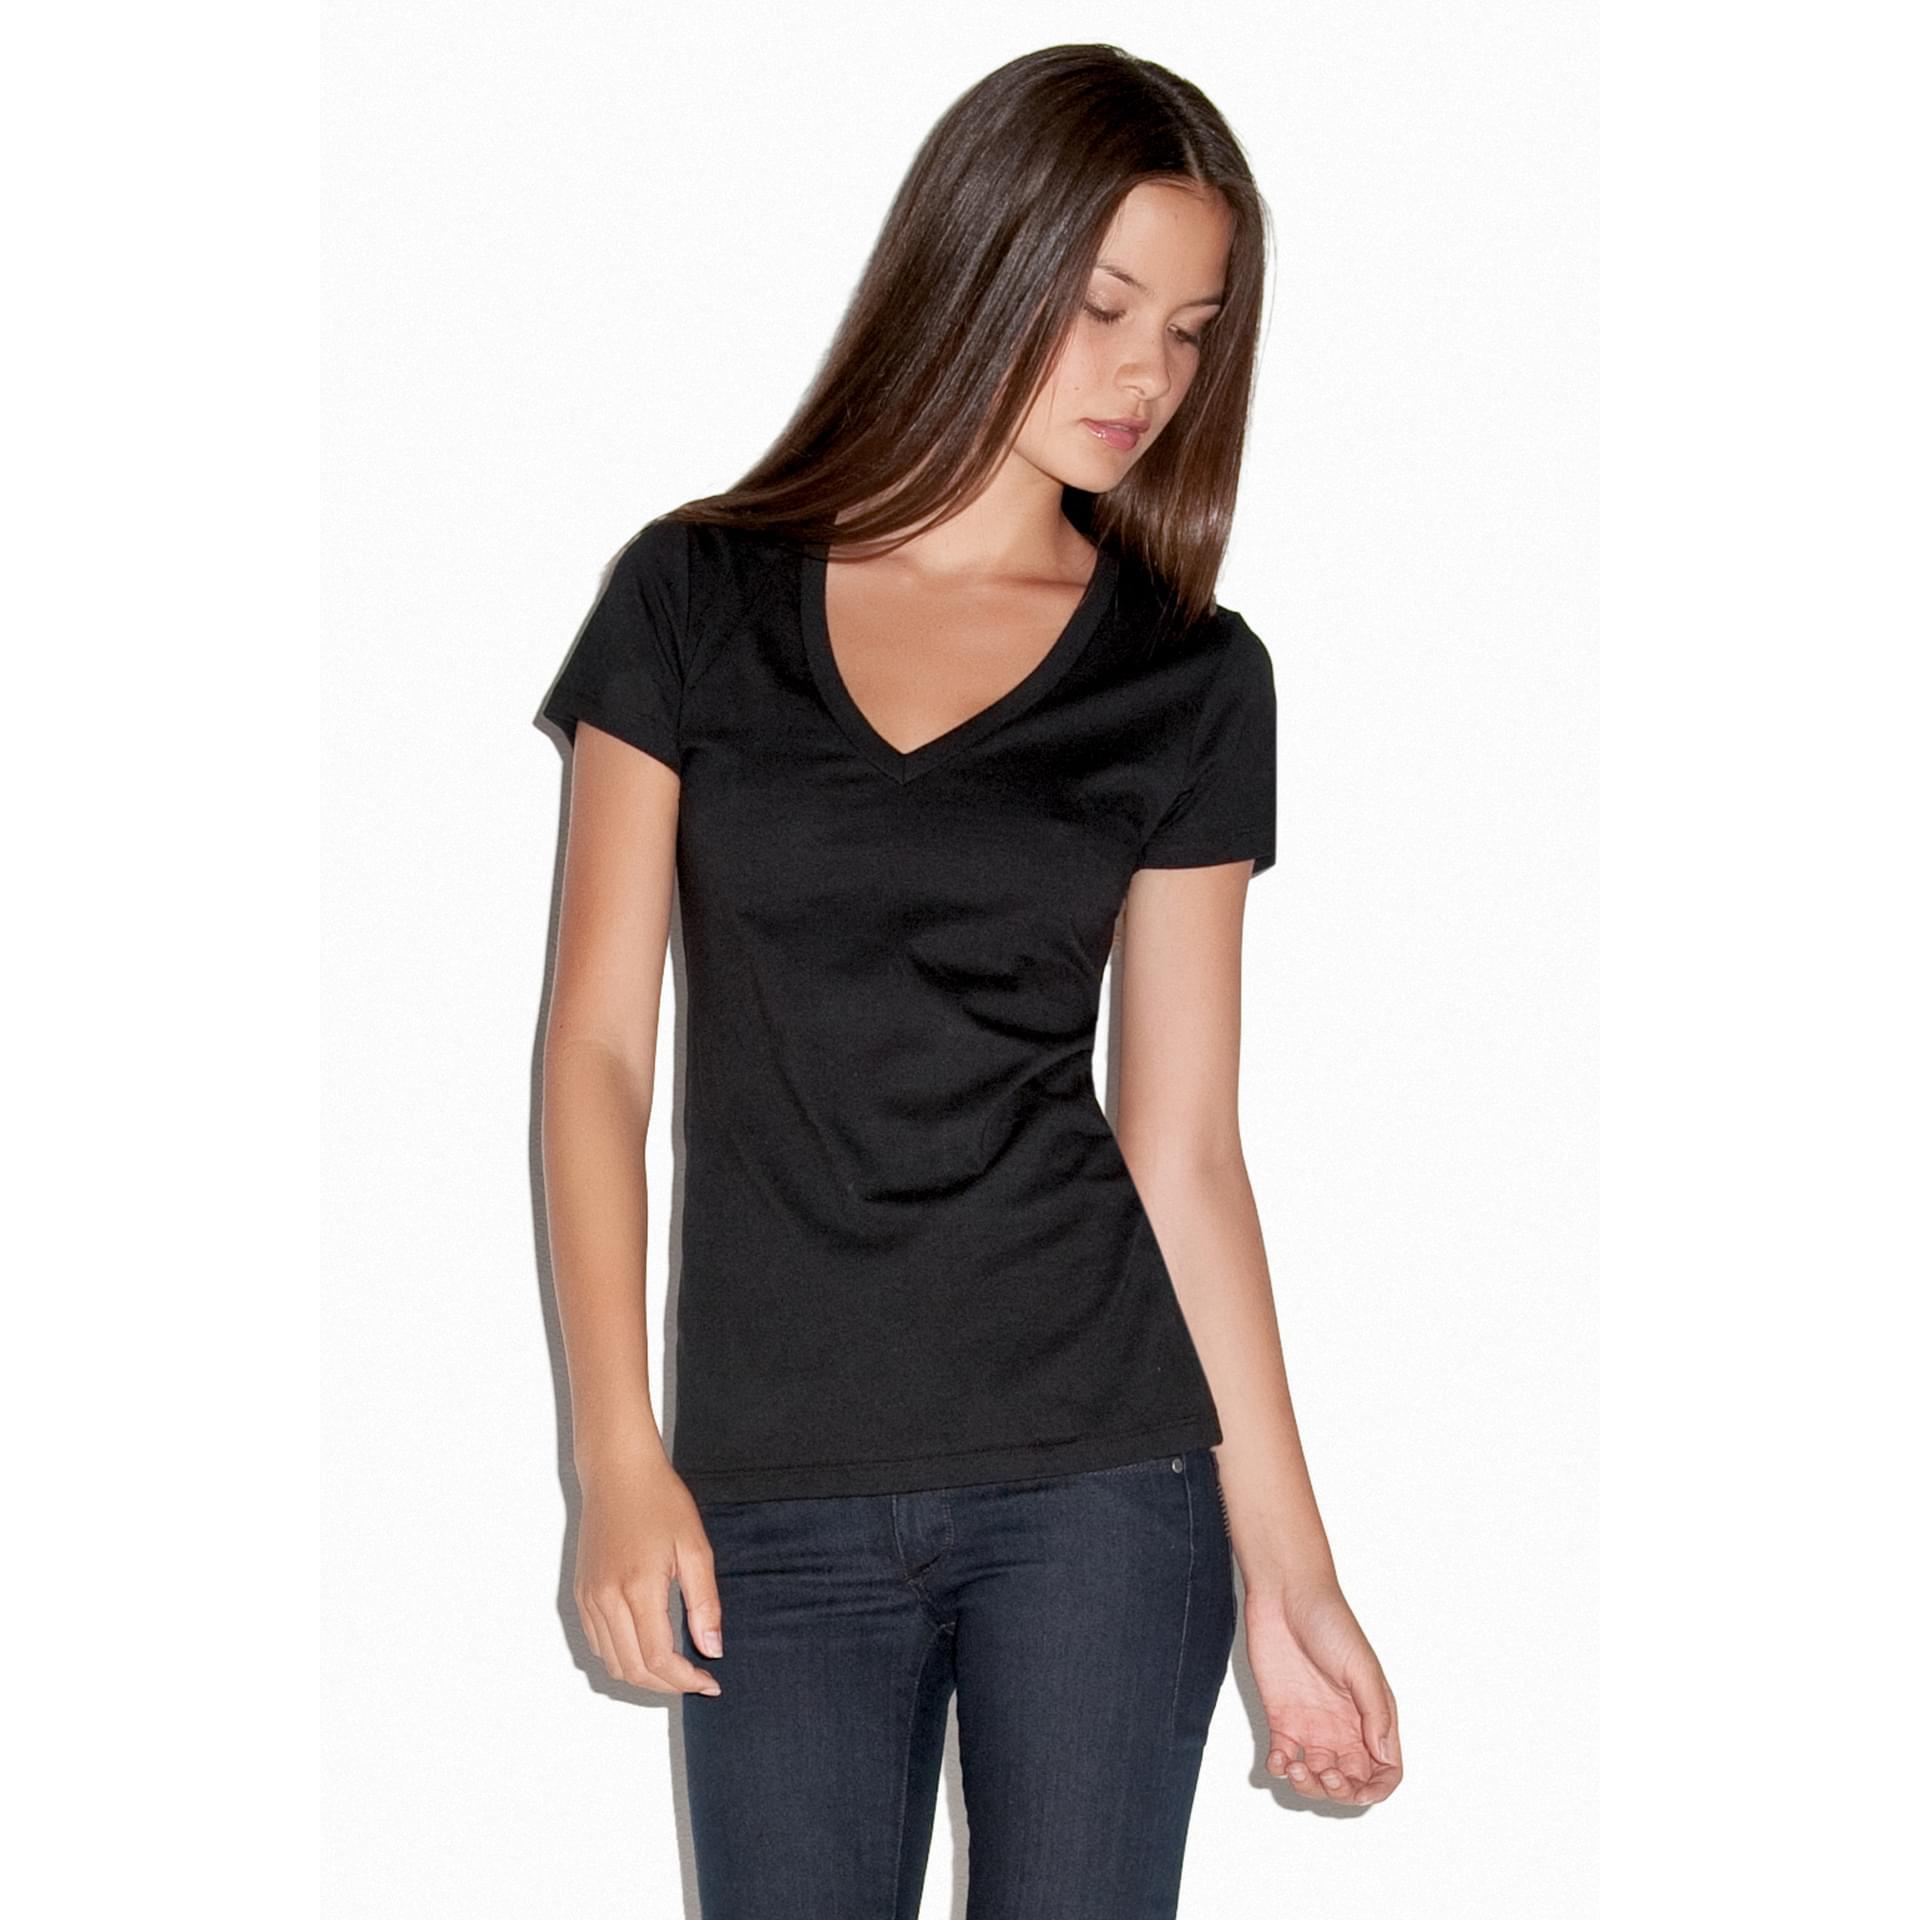 tee shirt personnalis jersey deep v neck t shirtt shirt. Black Bedroom Furniture Sets. Home Design Ideas